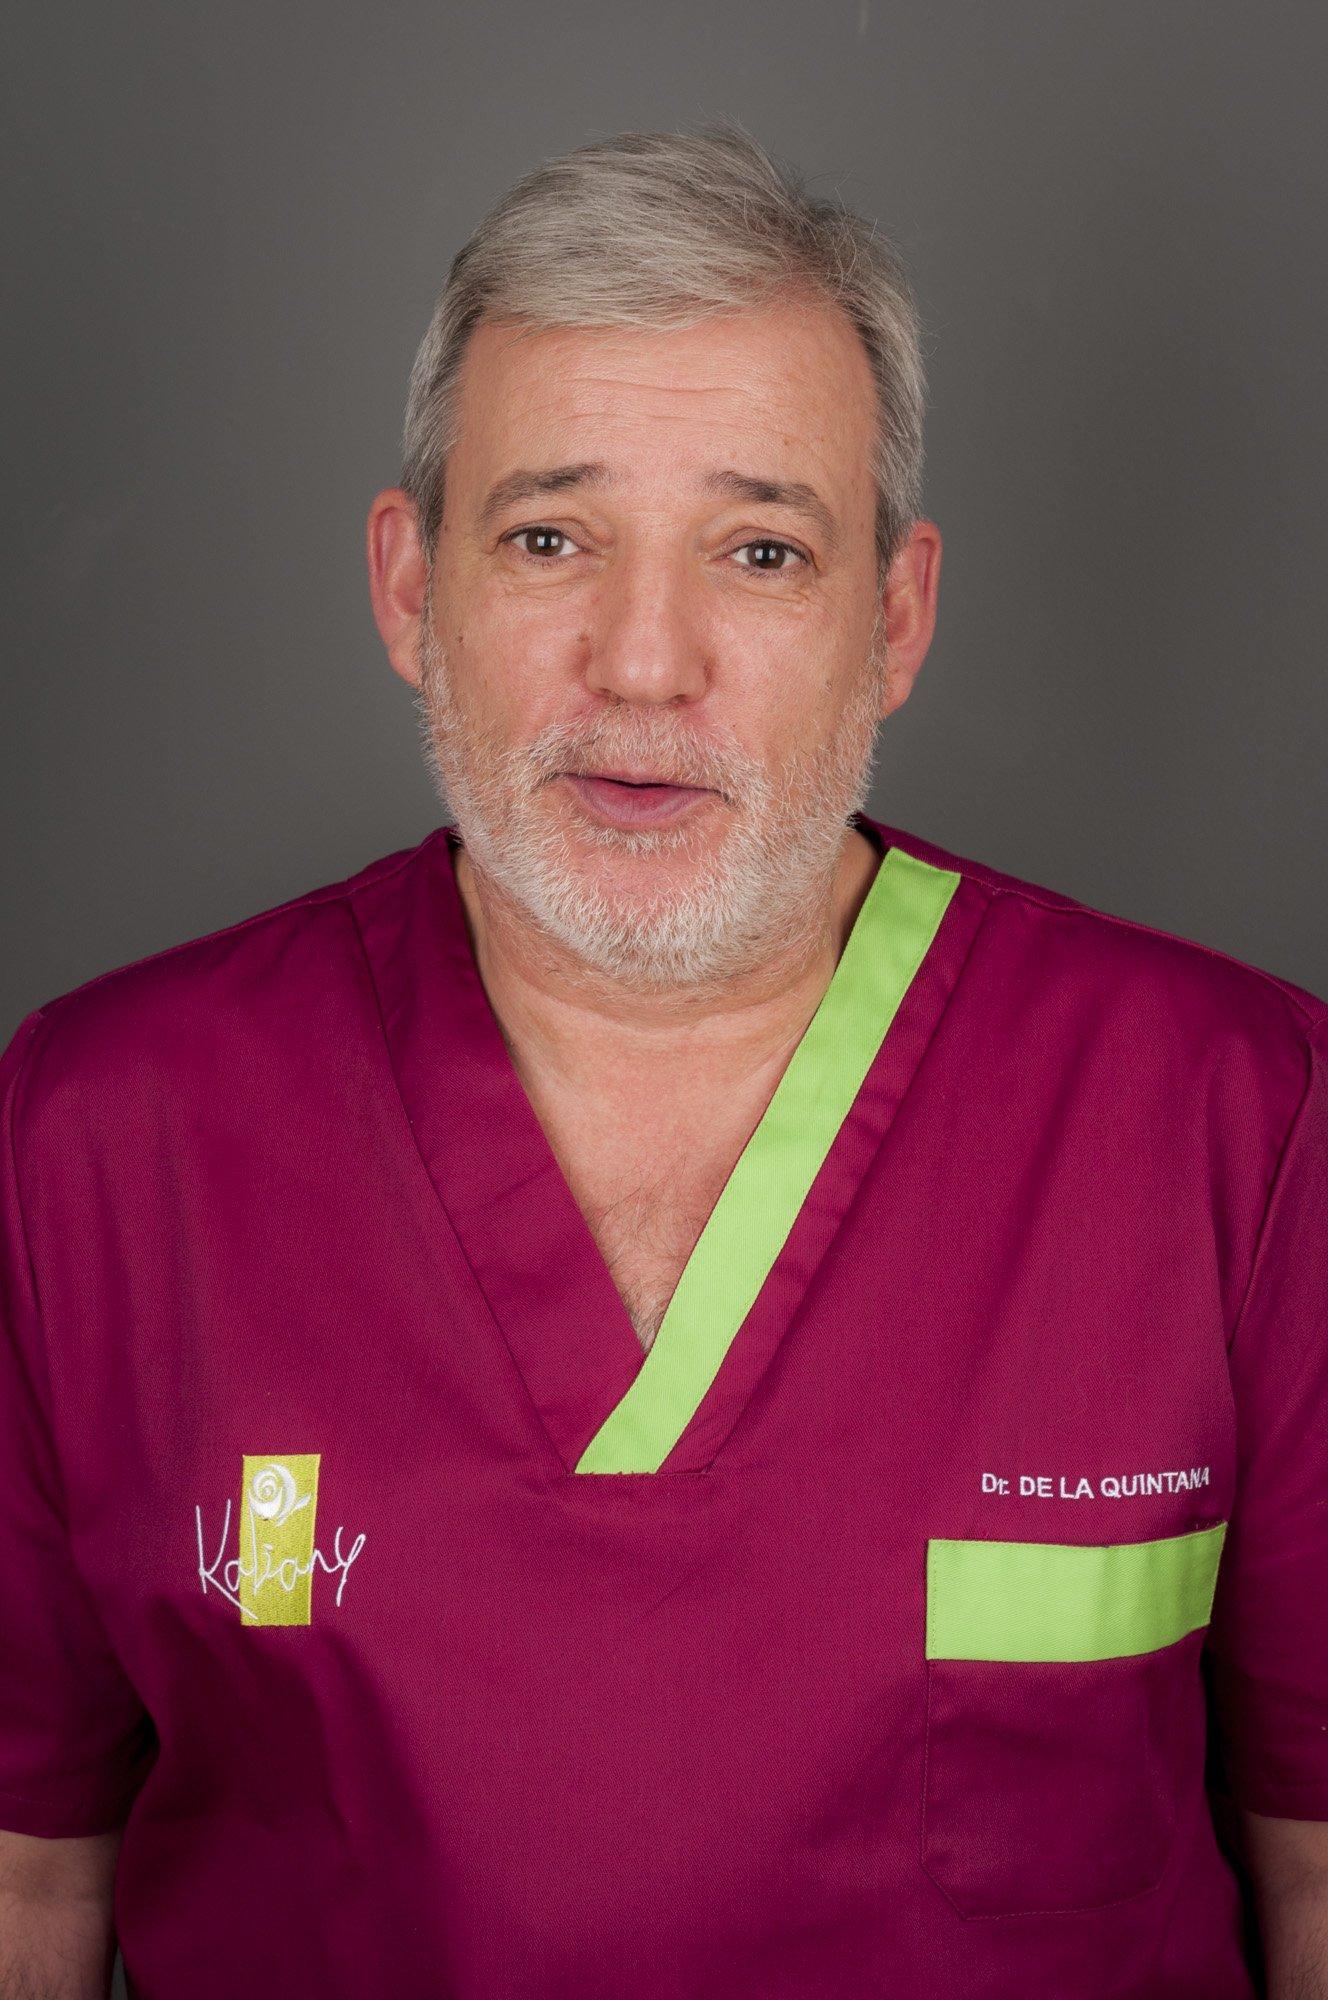 Doctor Agustin de la Quintana